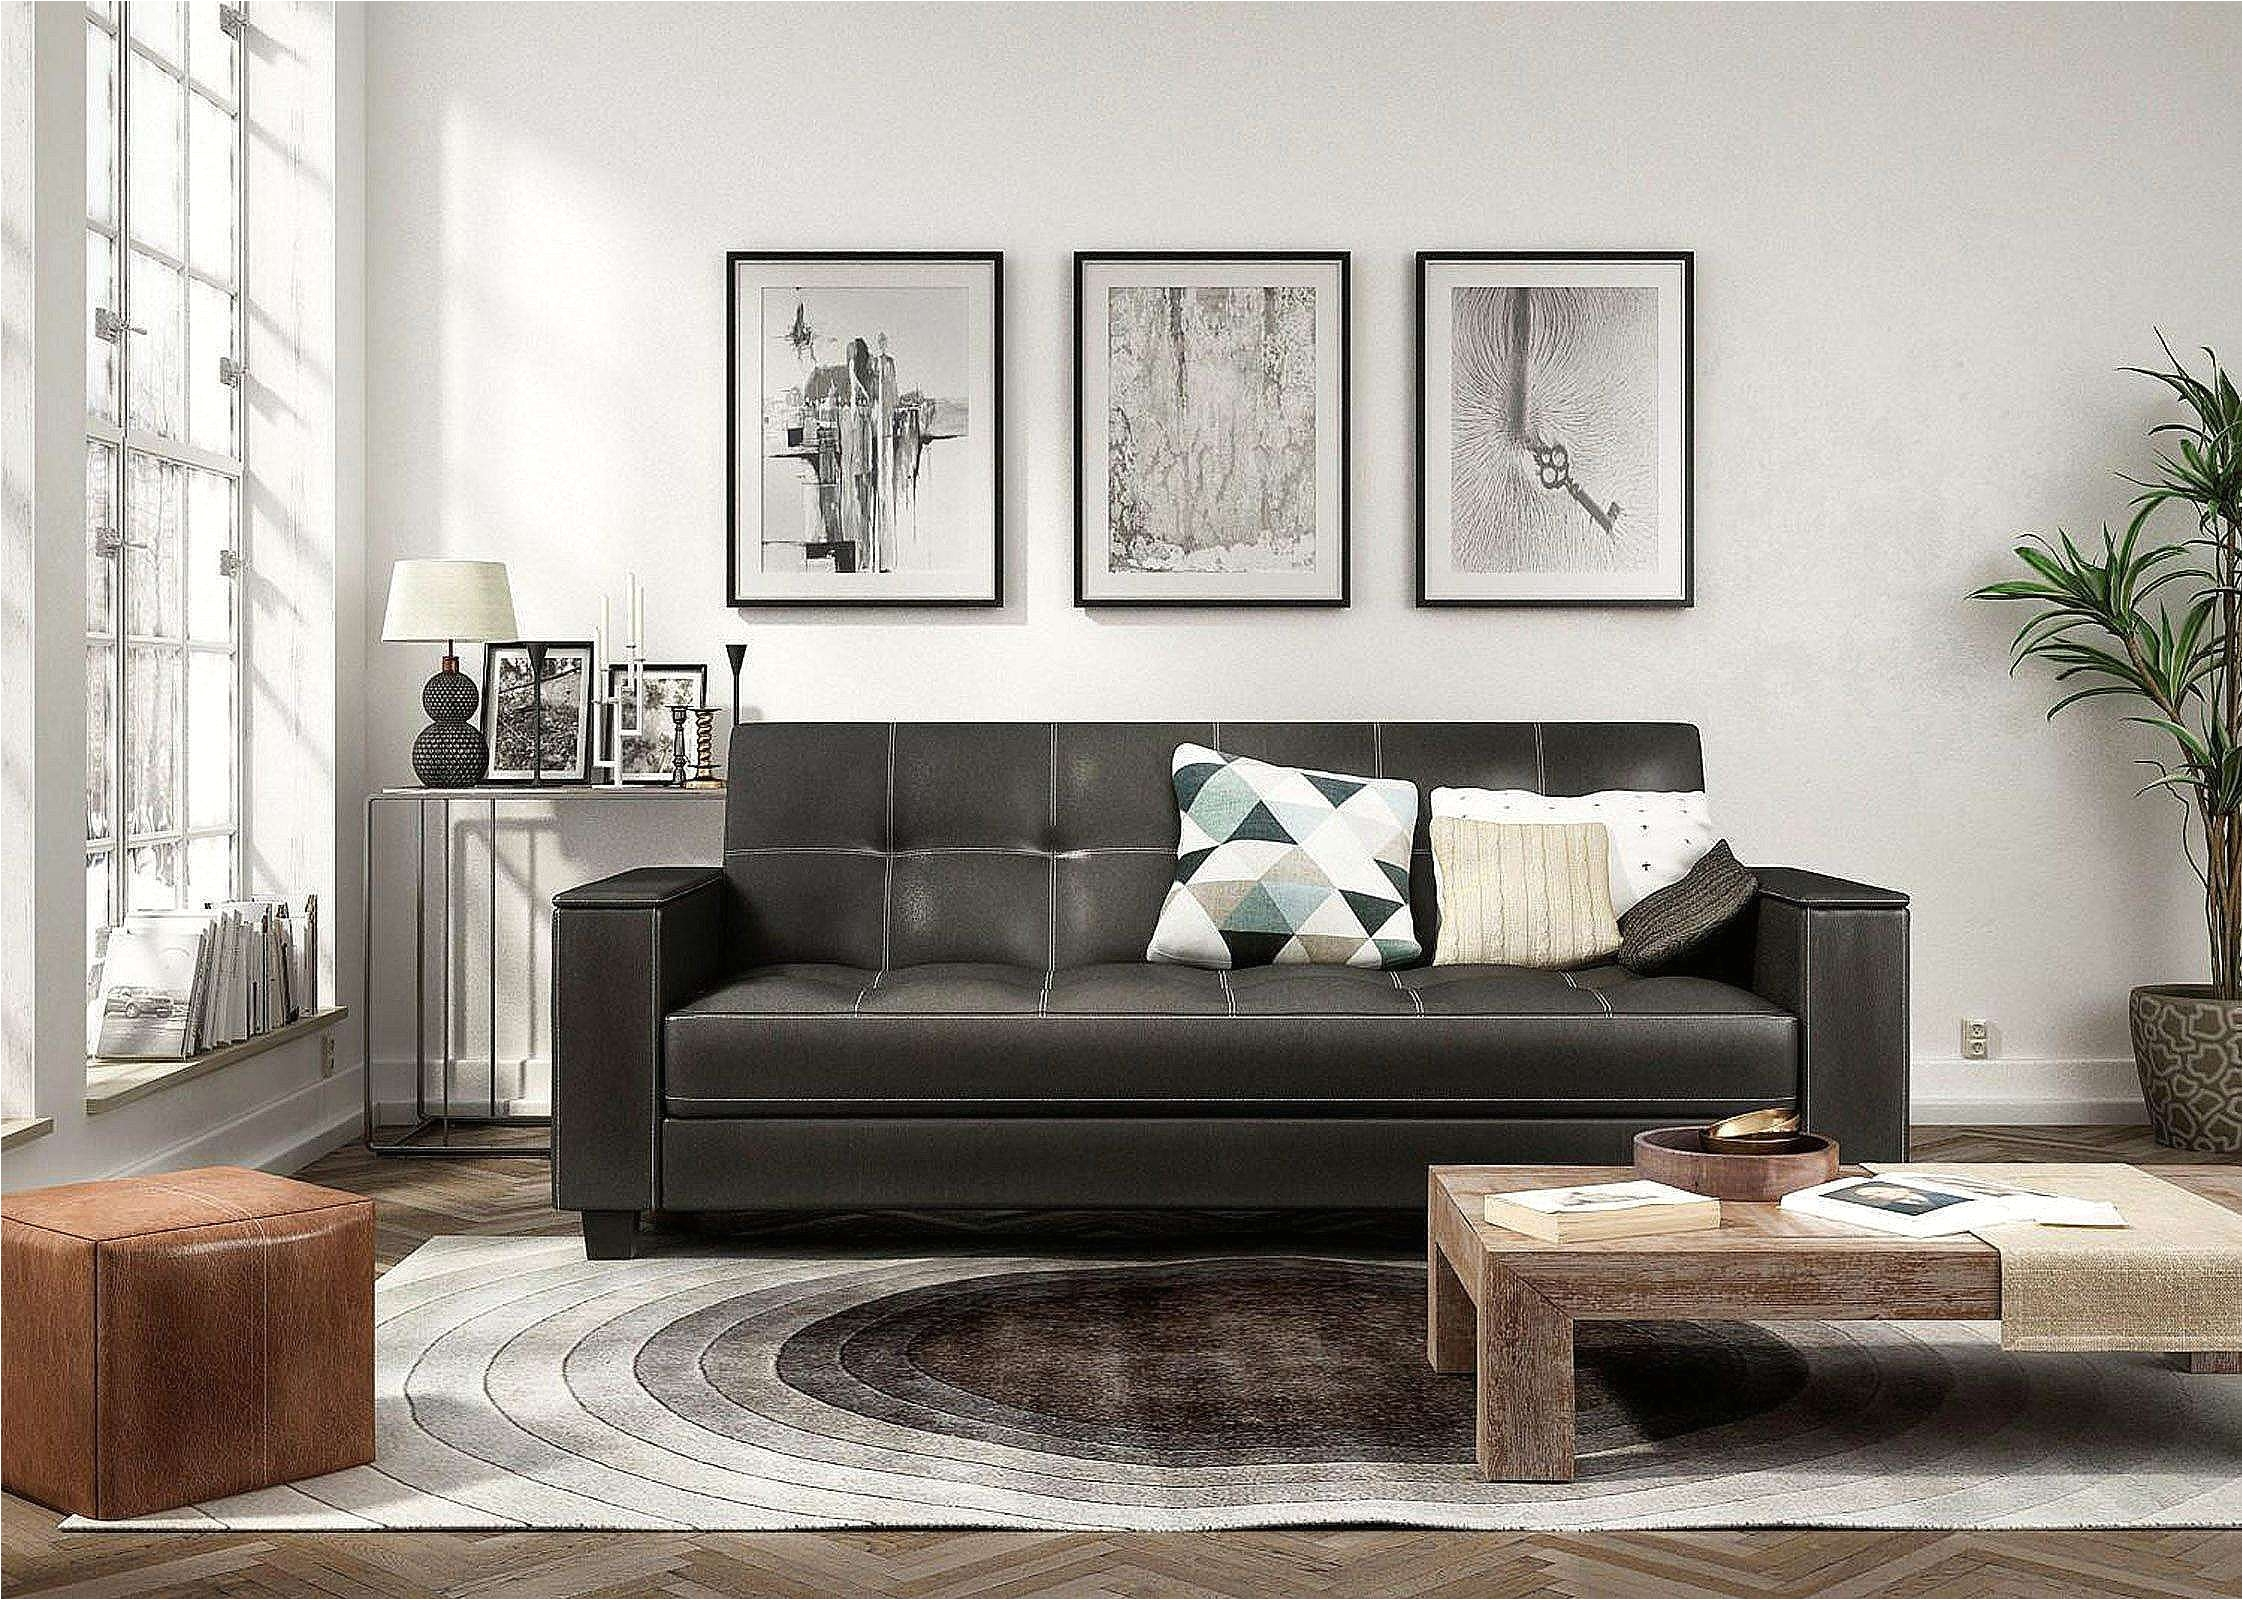 Macys Bedroom Sets On Sale Diy Bedroom Furniture Fresh Modern Living Room  Furniture New